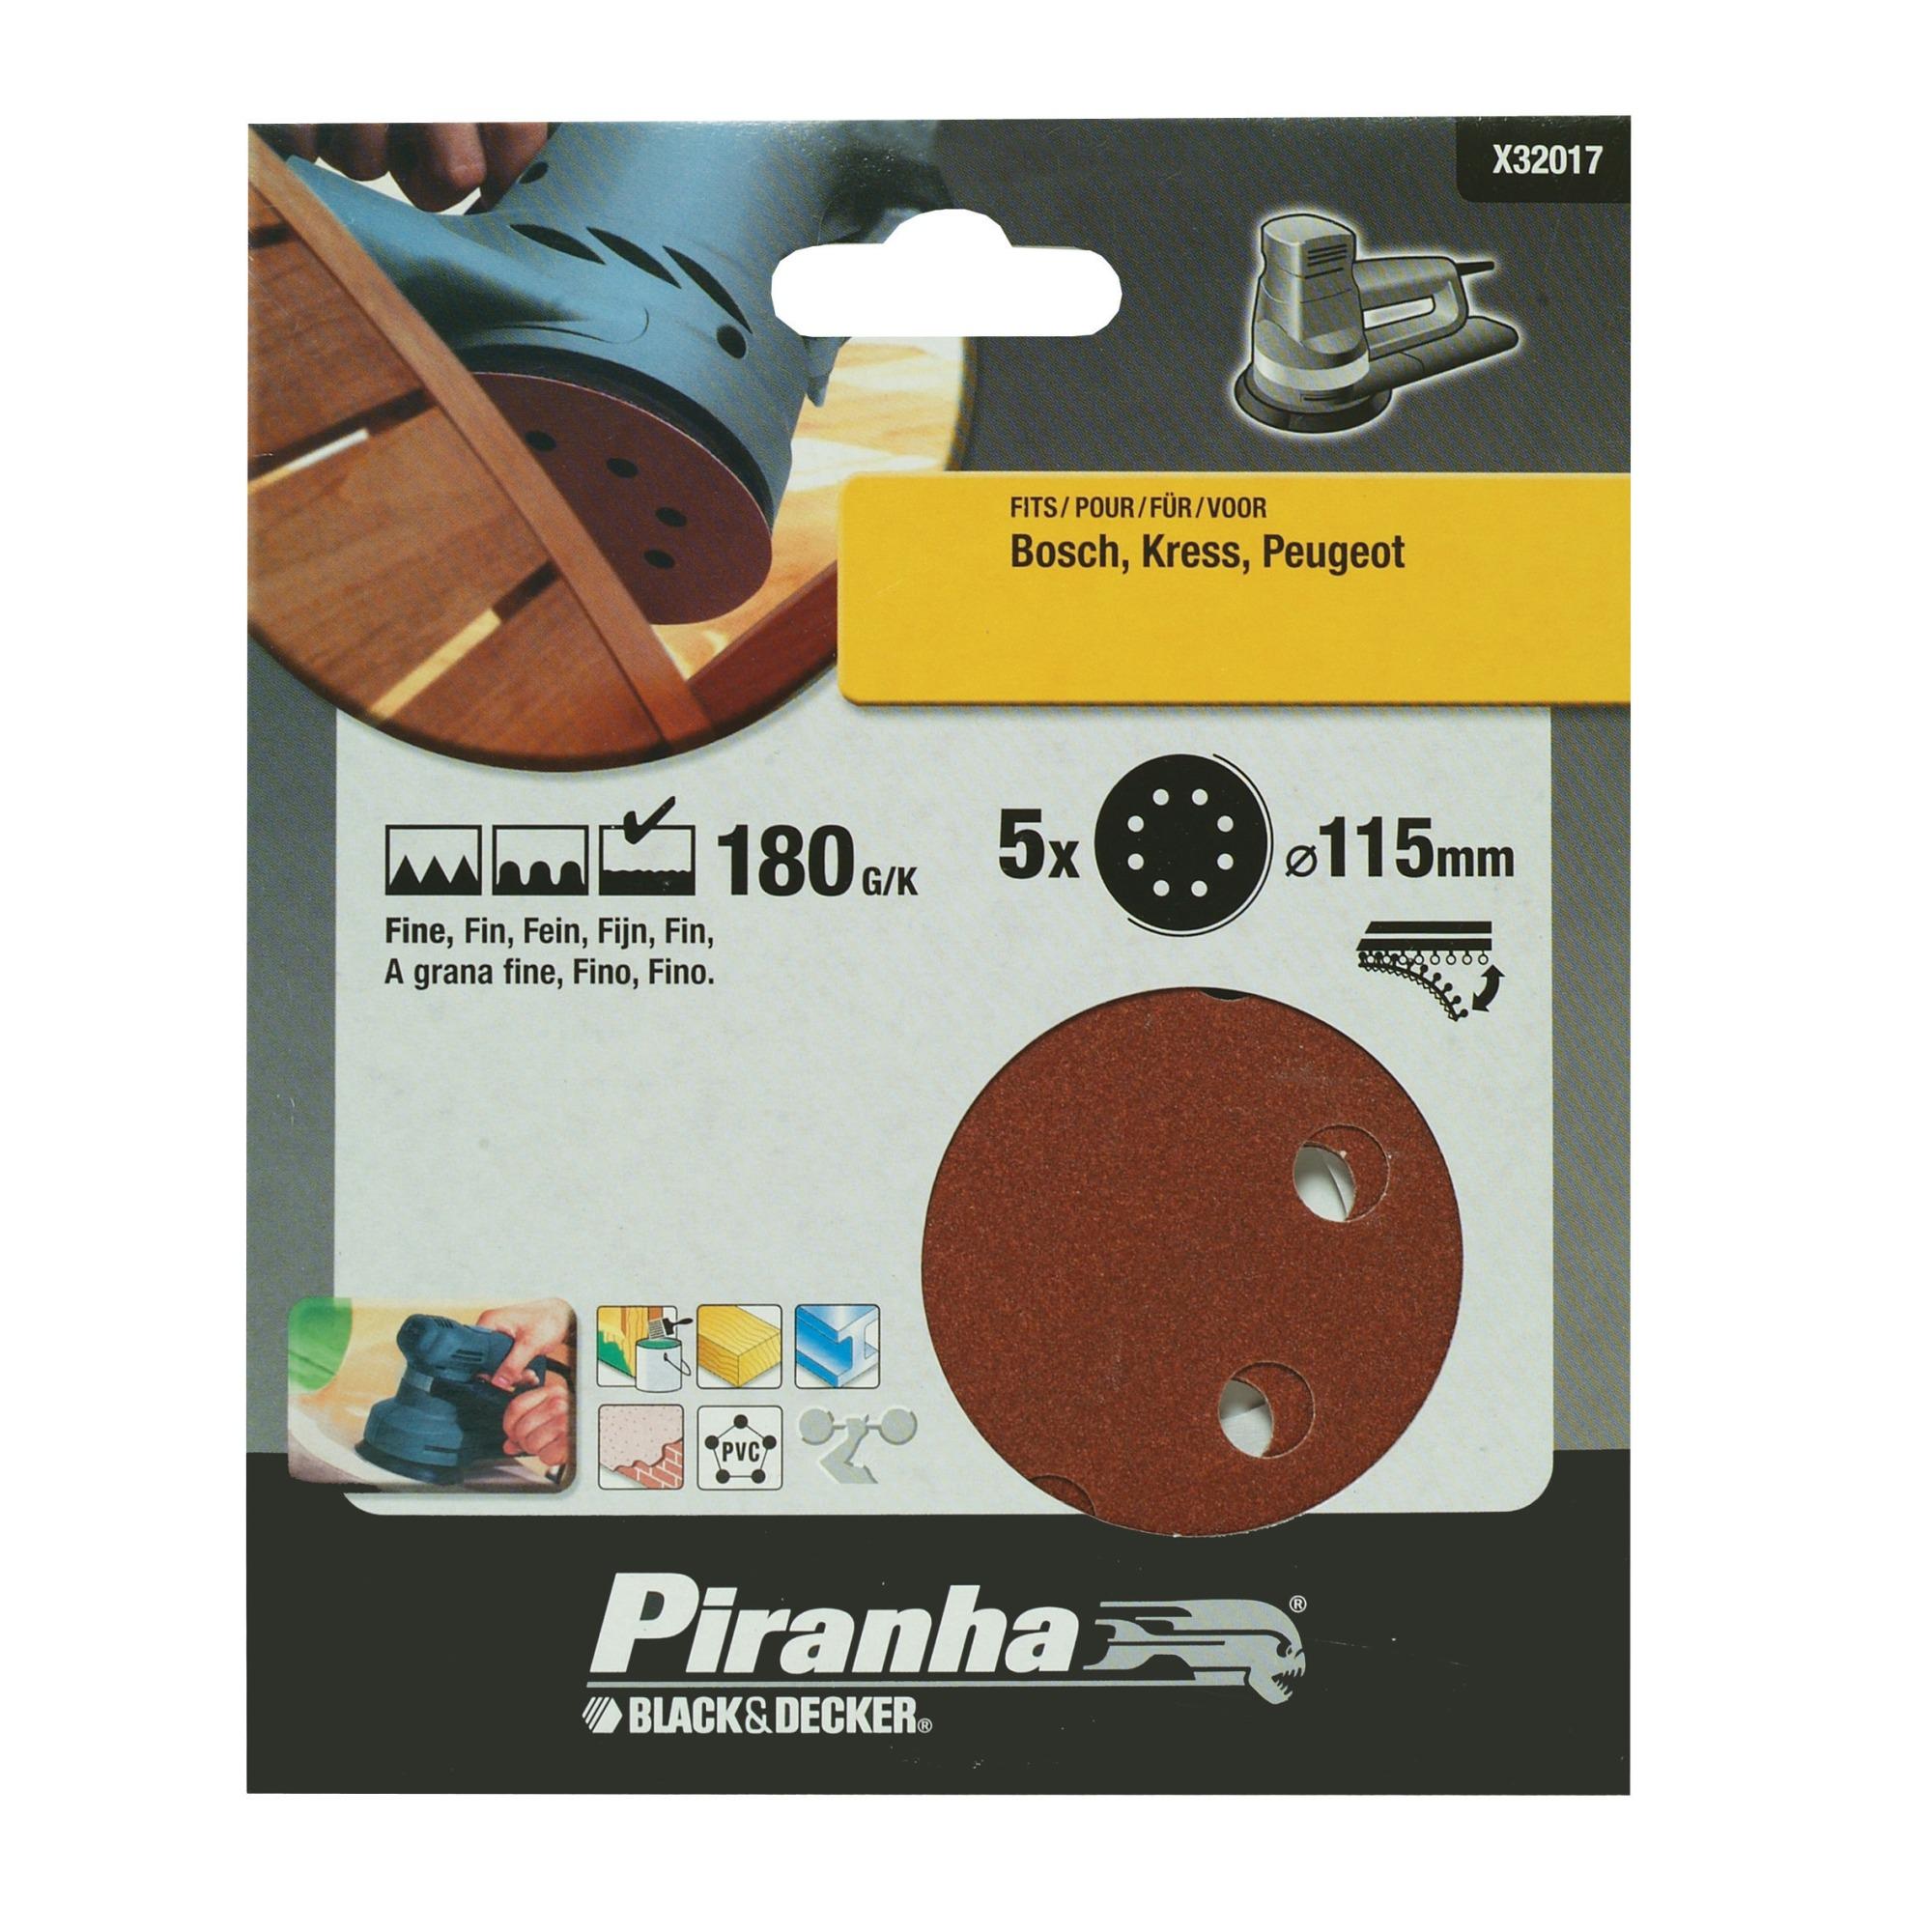 Piranha schuurschijf X32017 K180 115 mm (5 stuks)